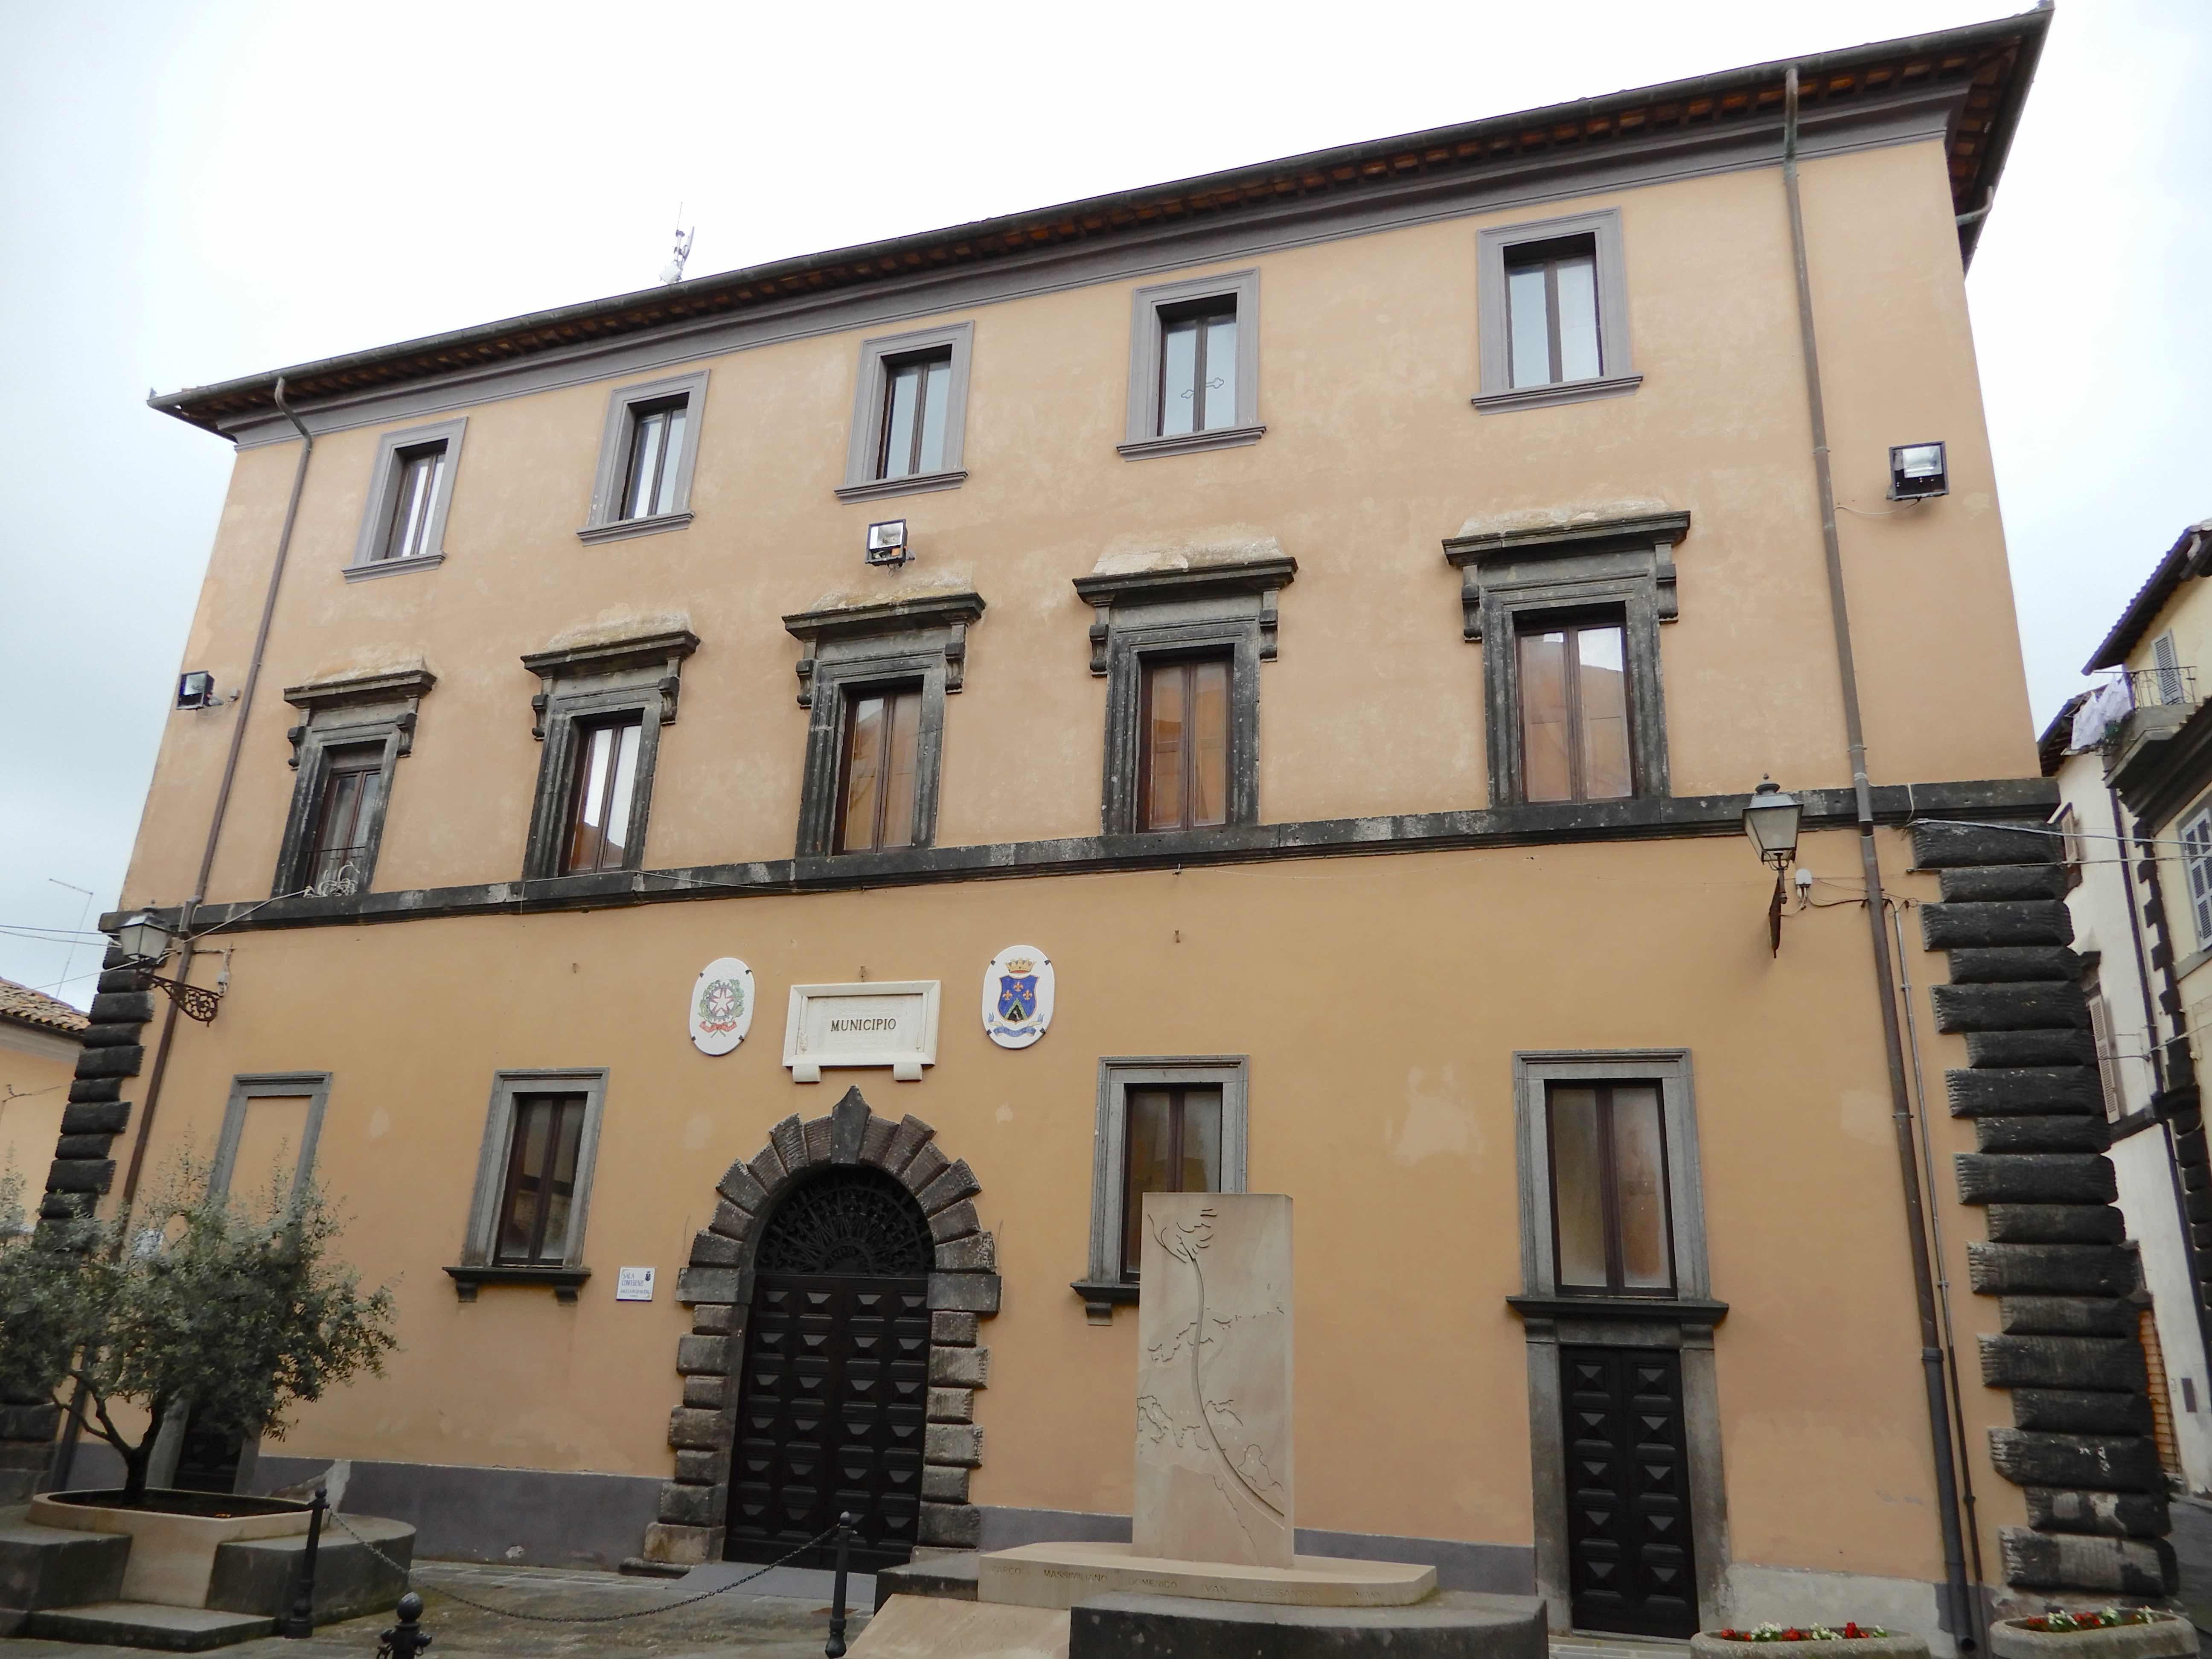 20.Town Hall